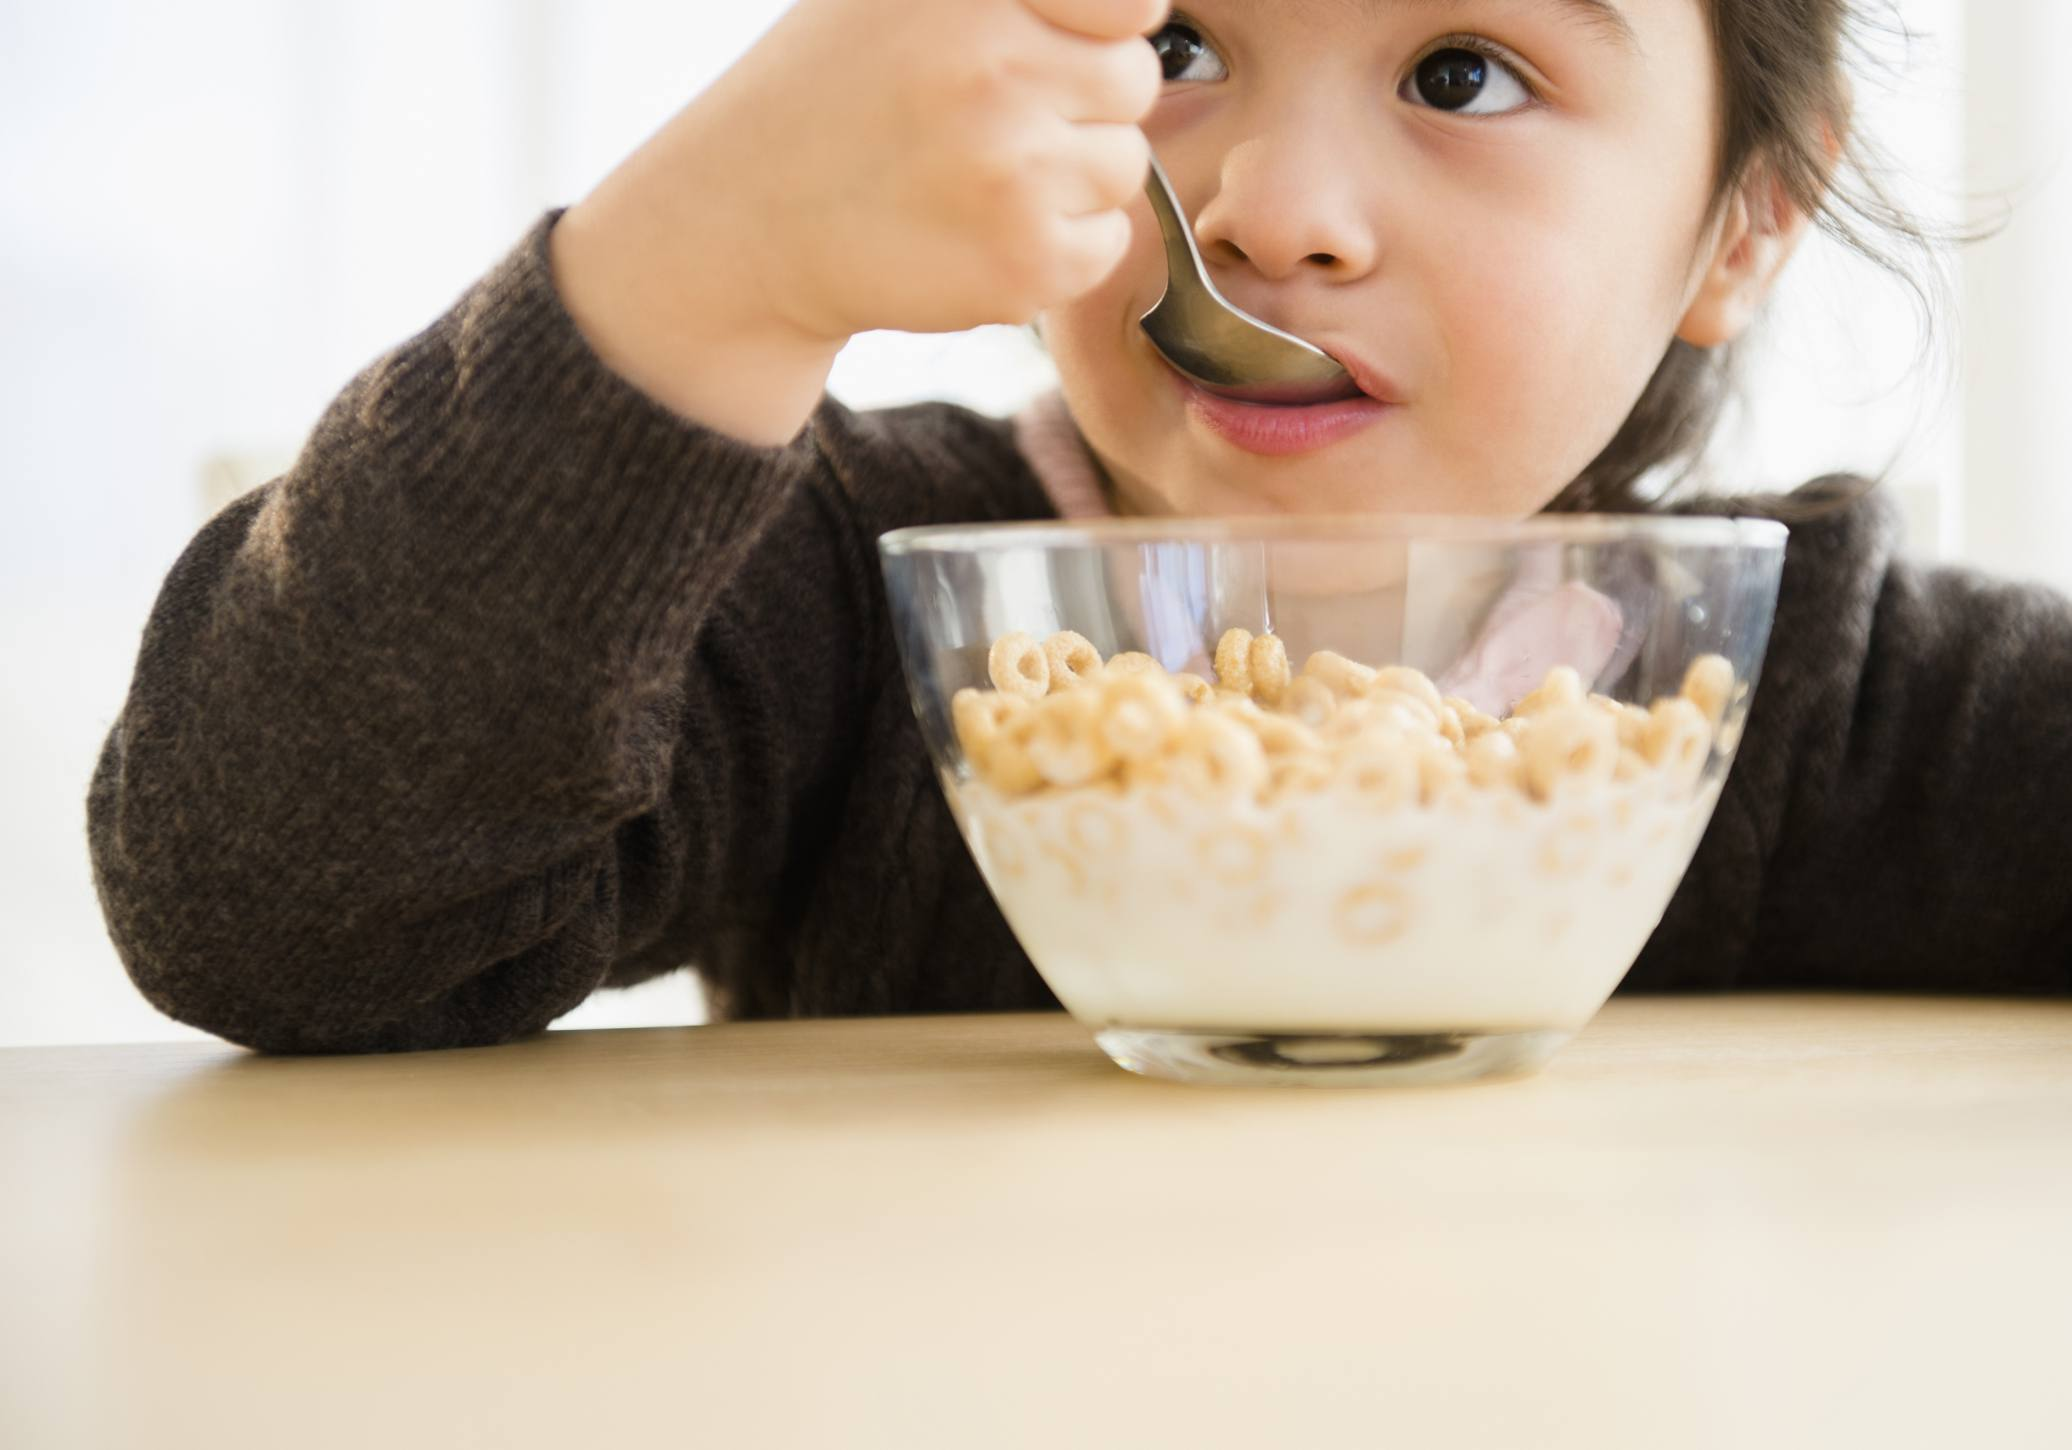 preschooler eating a bowl of cereal.